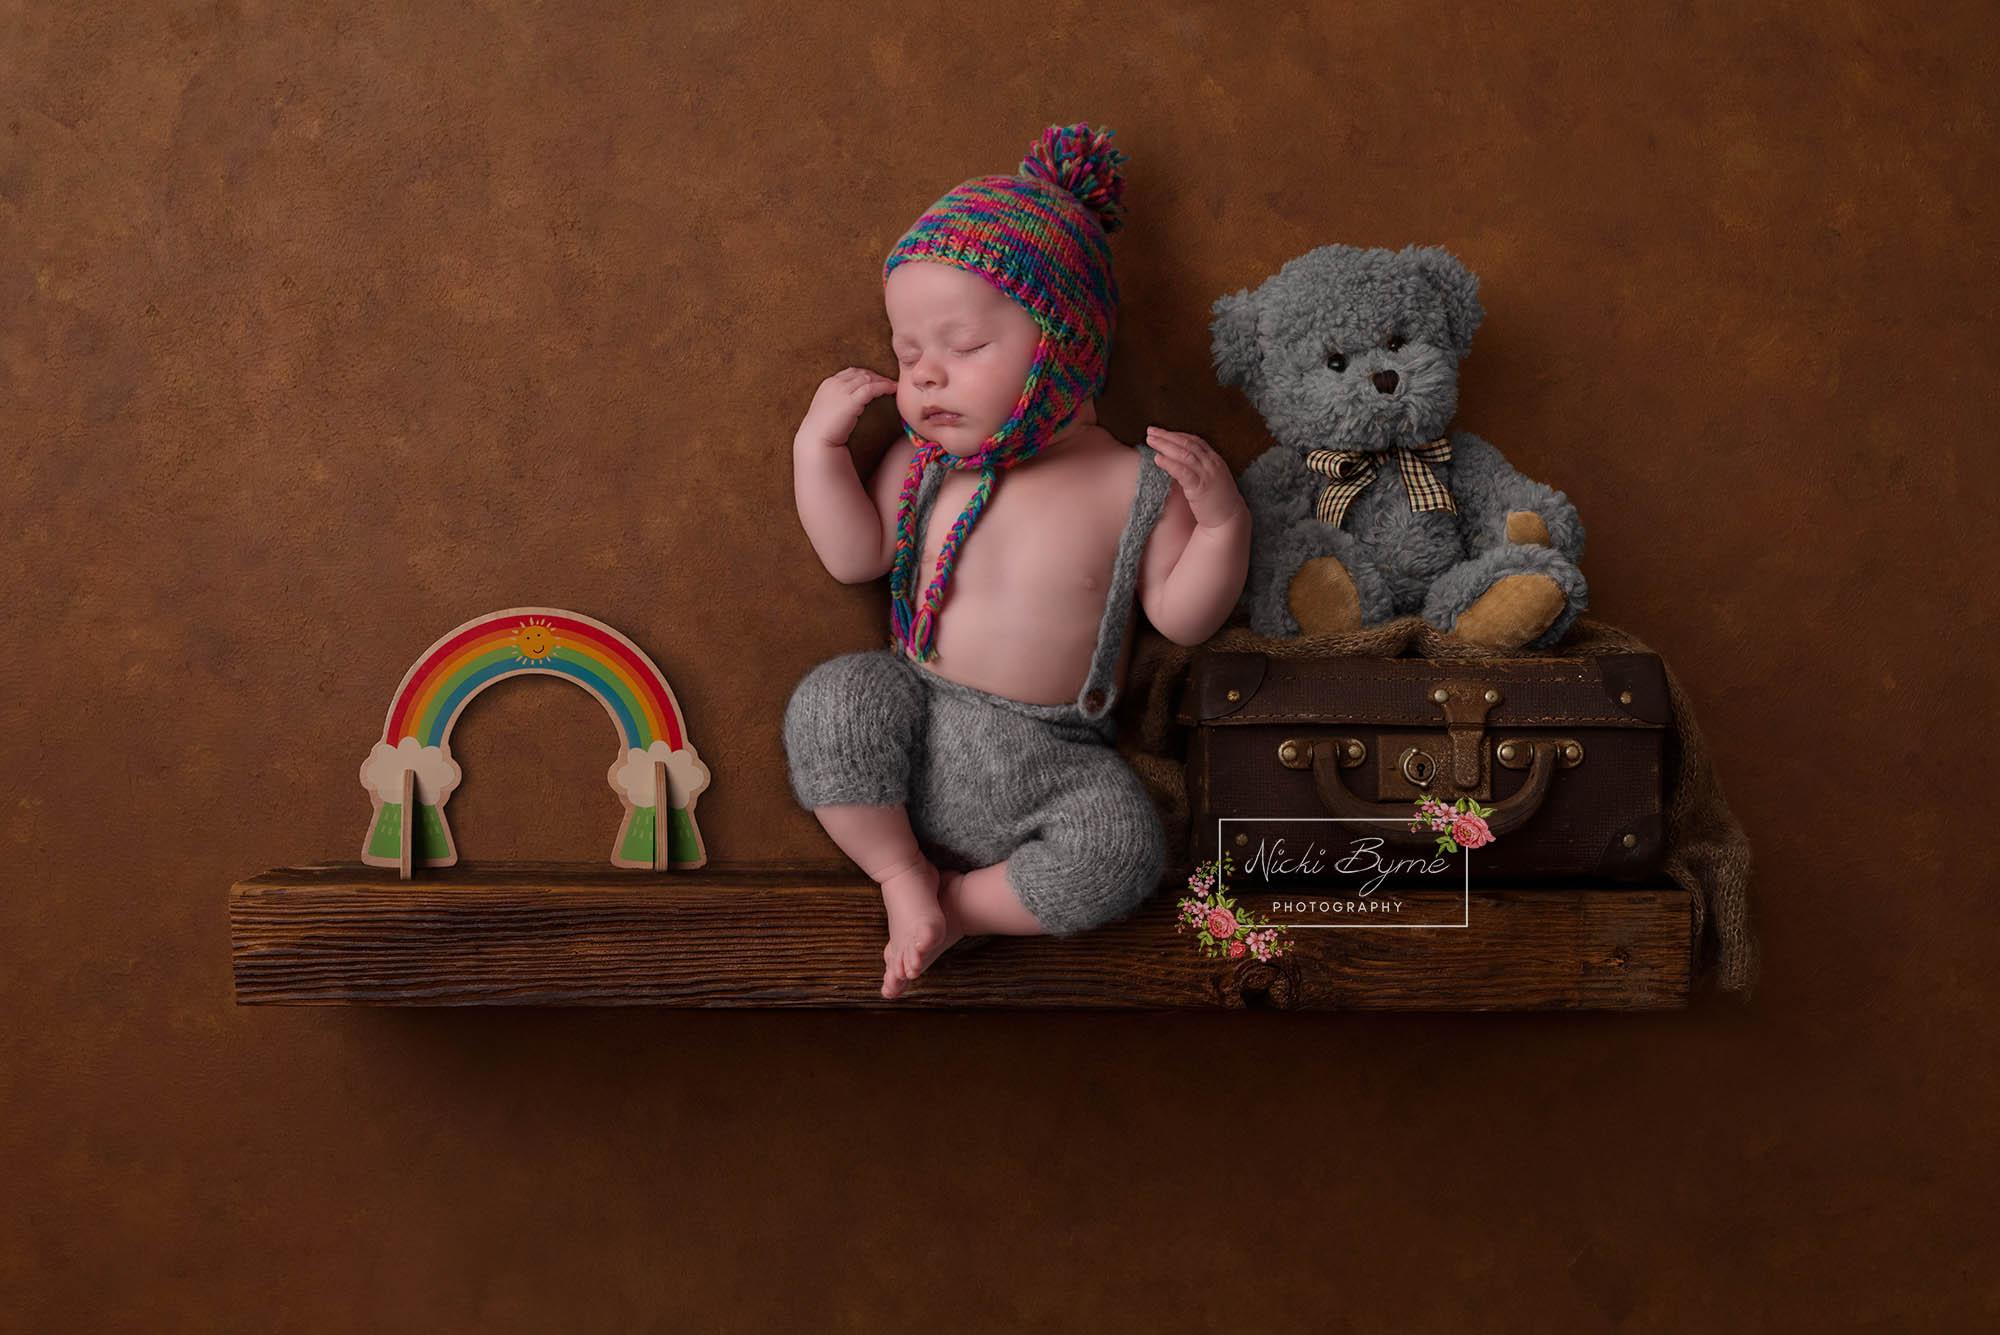 Rainbow Baby newborn photographer sutton coldfield